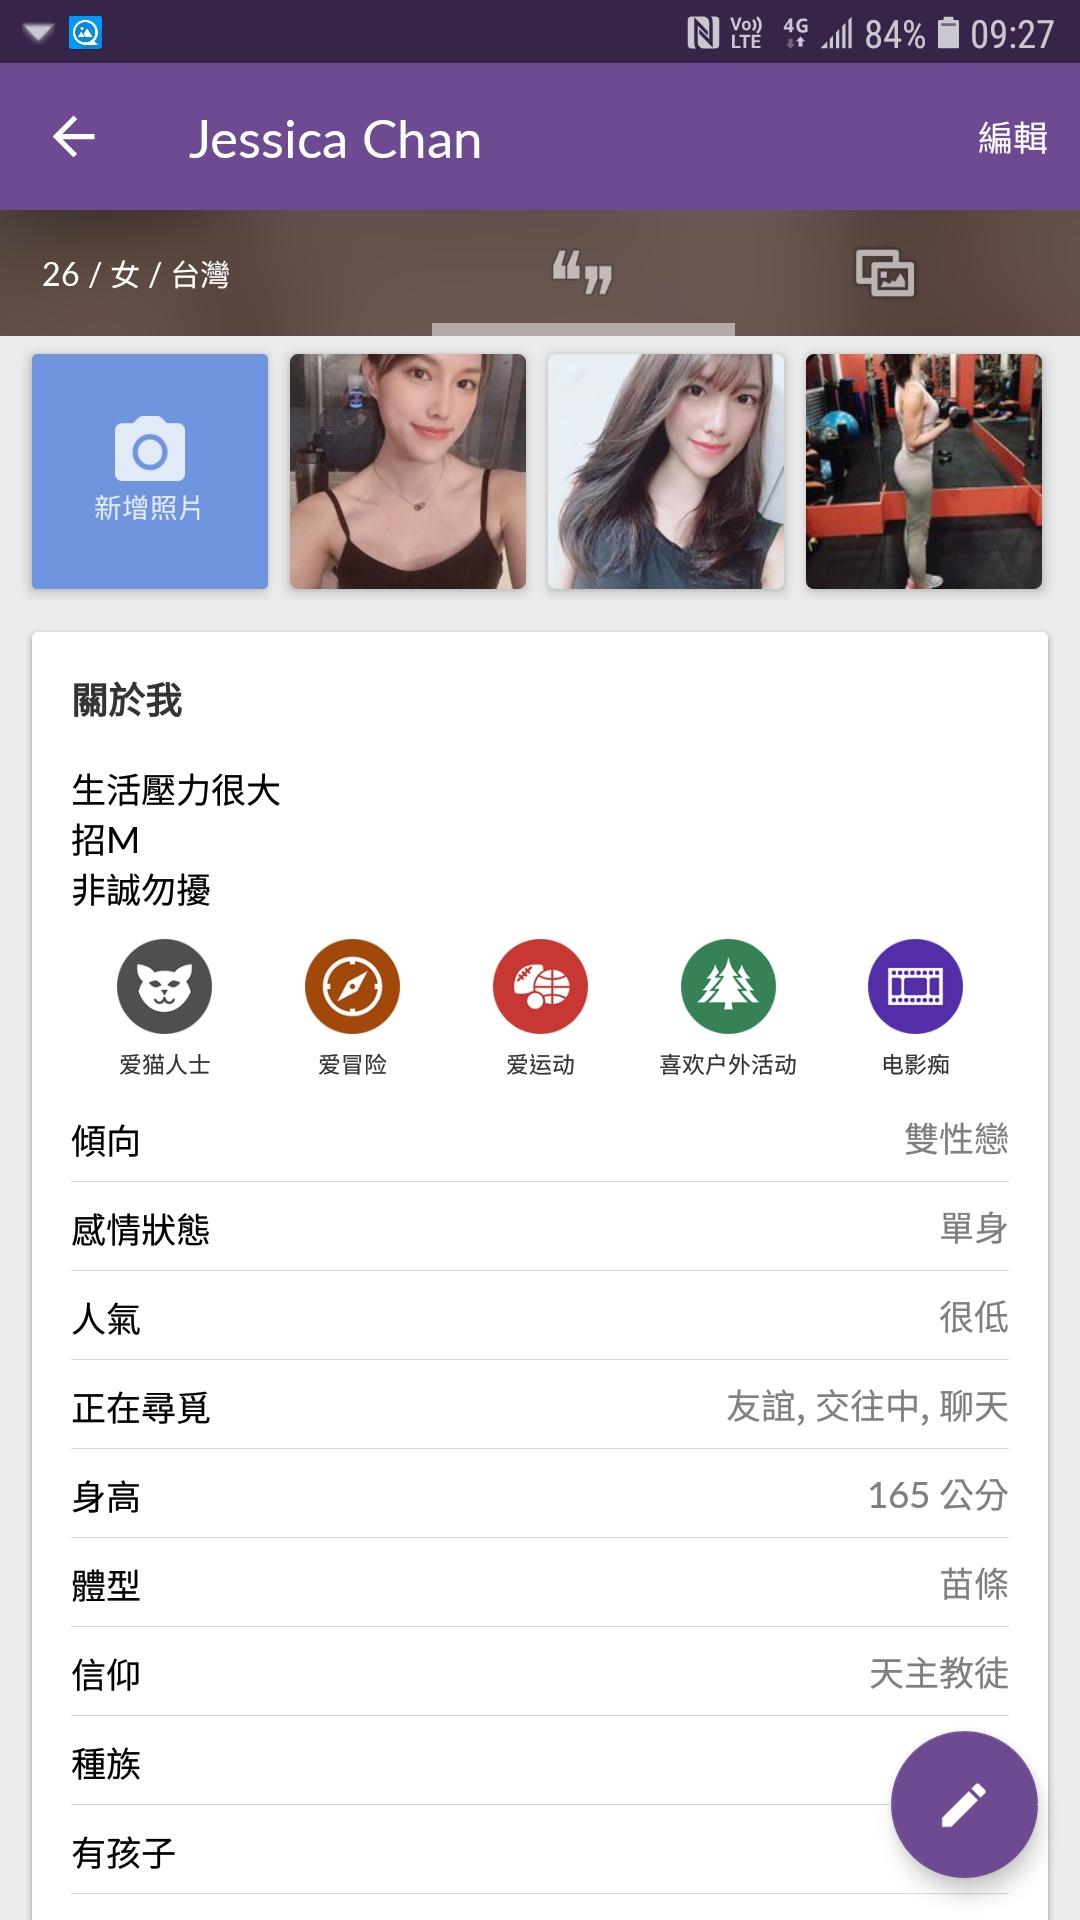 https://i.ibb.co/DkNFNh3/Screenshot-20200208-092738-Meet-Me.jpg